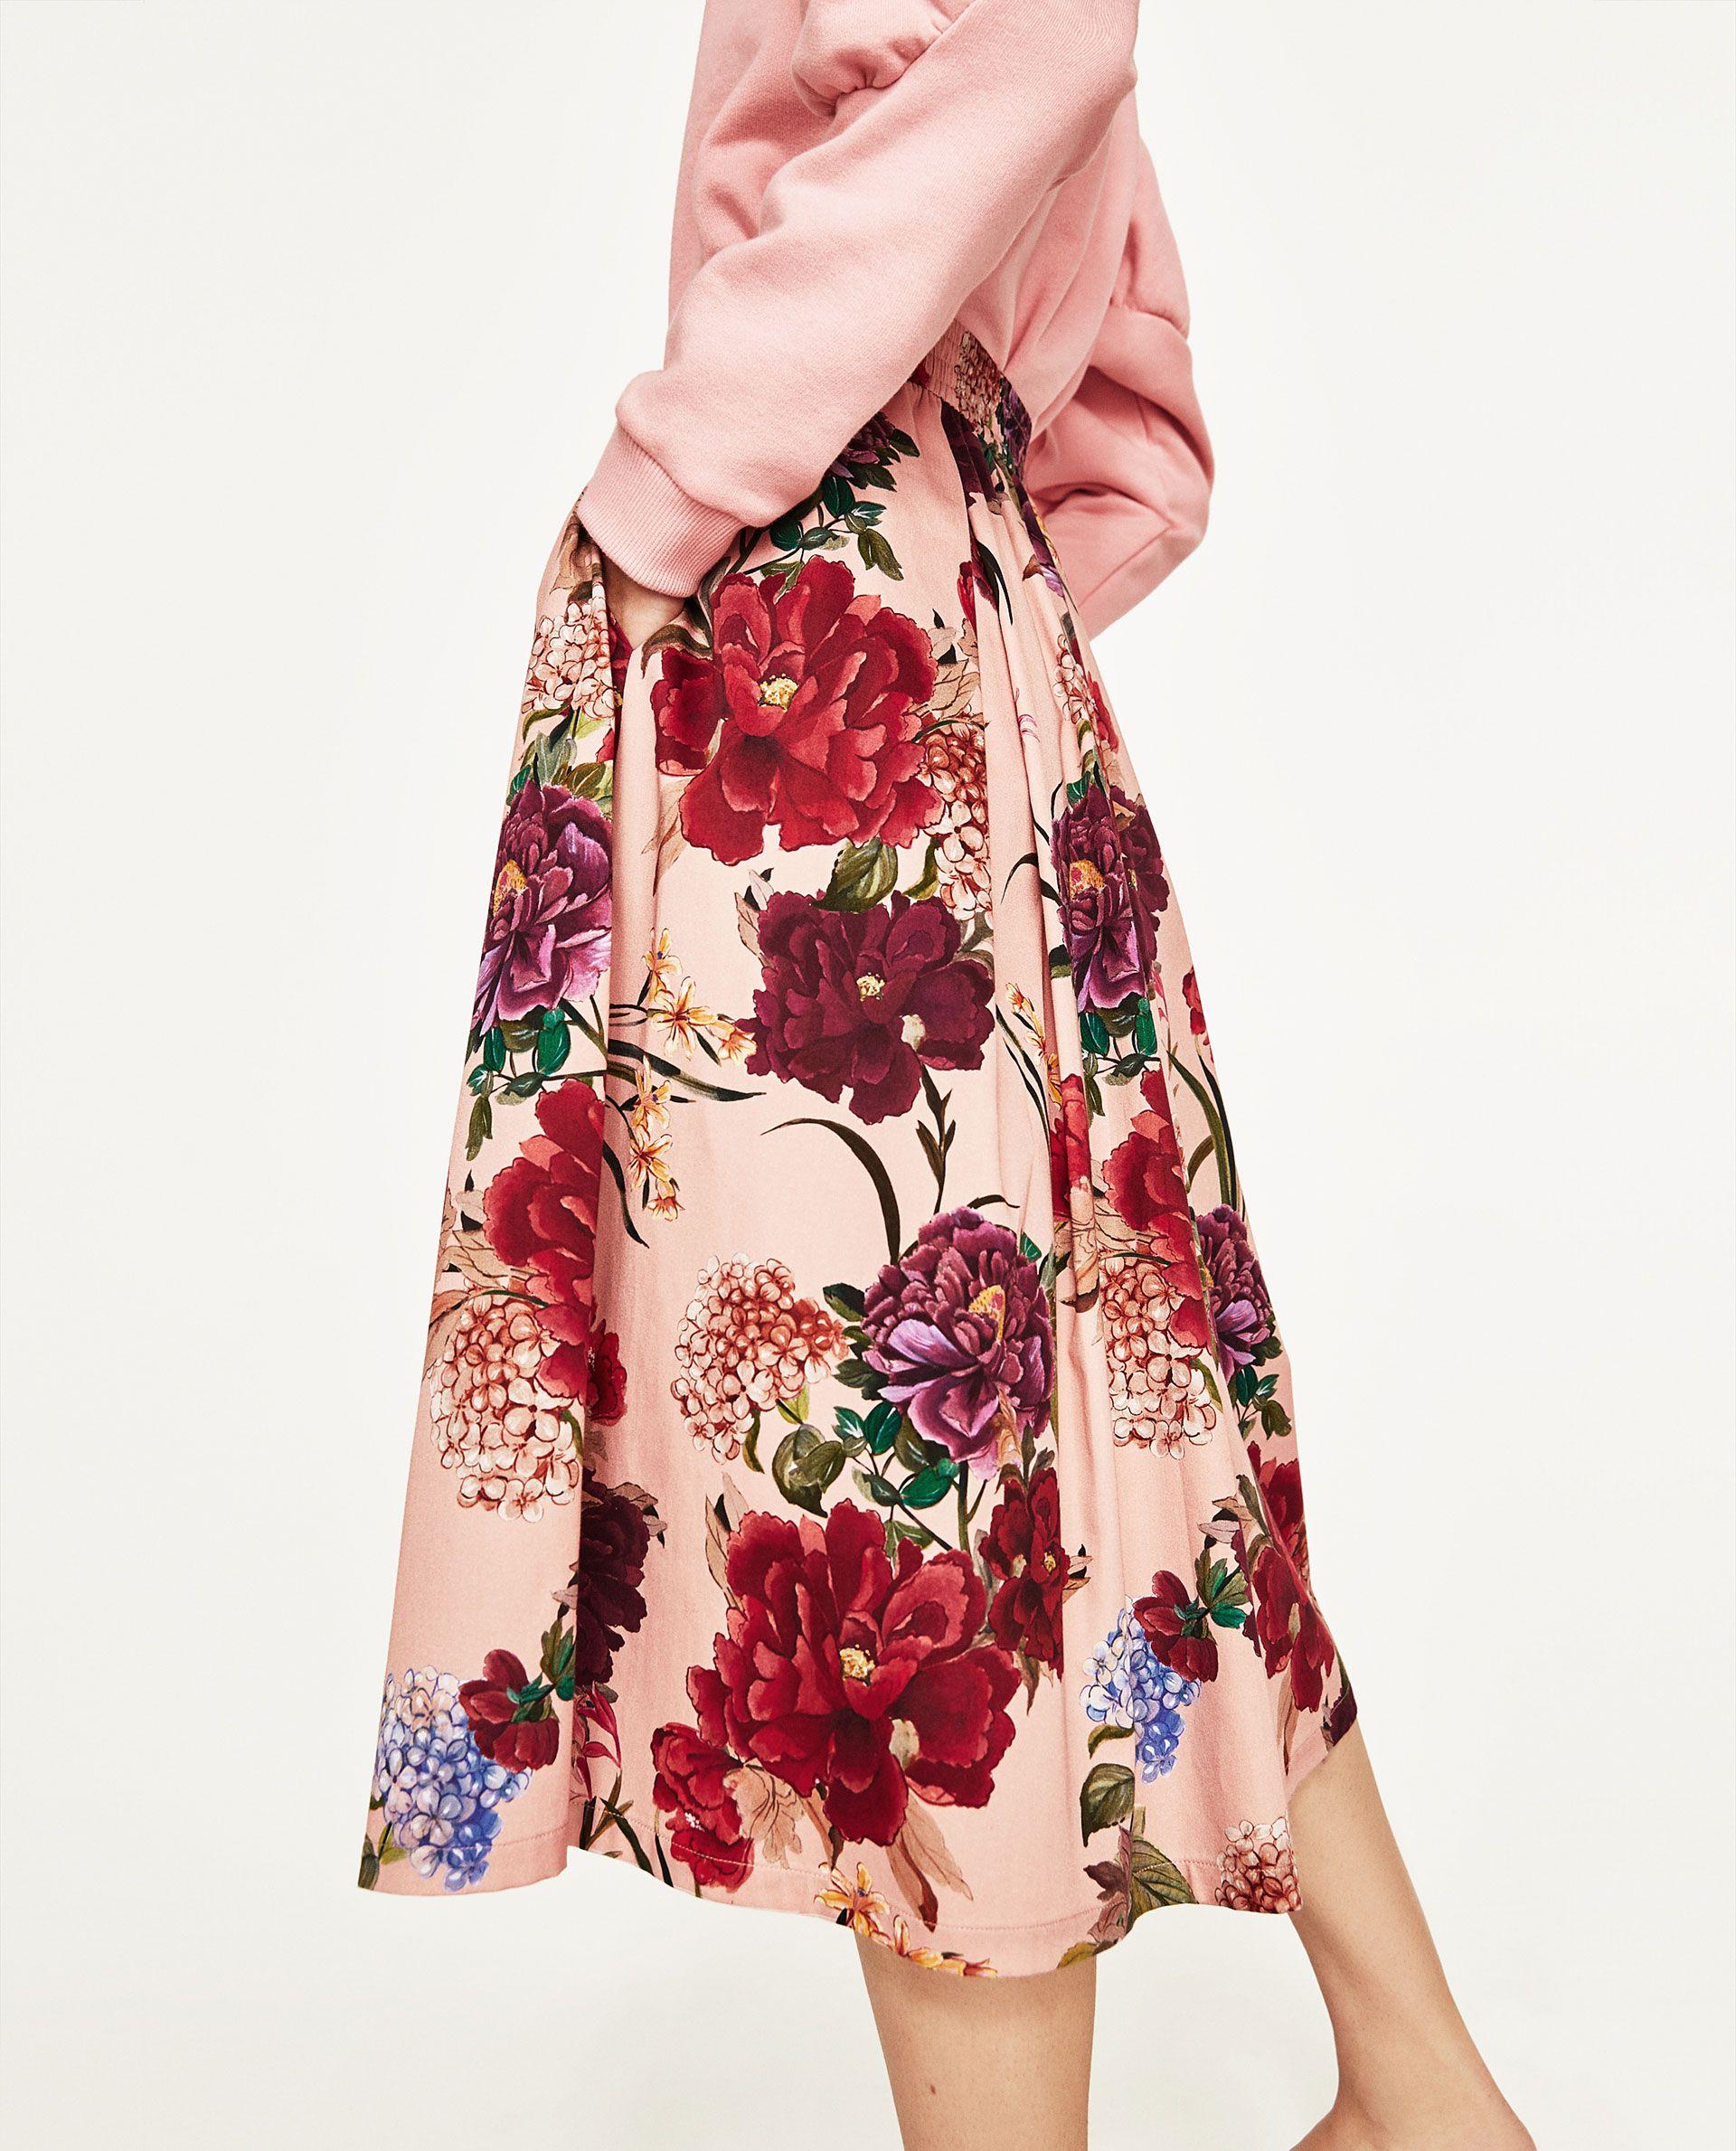 d38439d761 ZARA pink floral print skirt | MINE | Floral print skirt, Floral ...